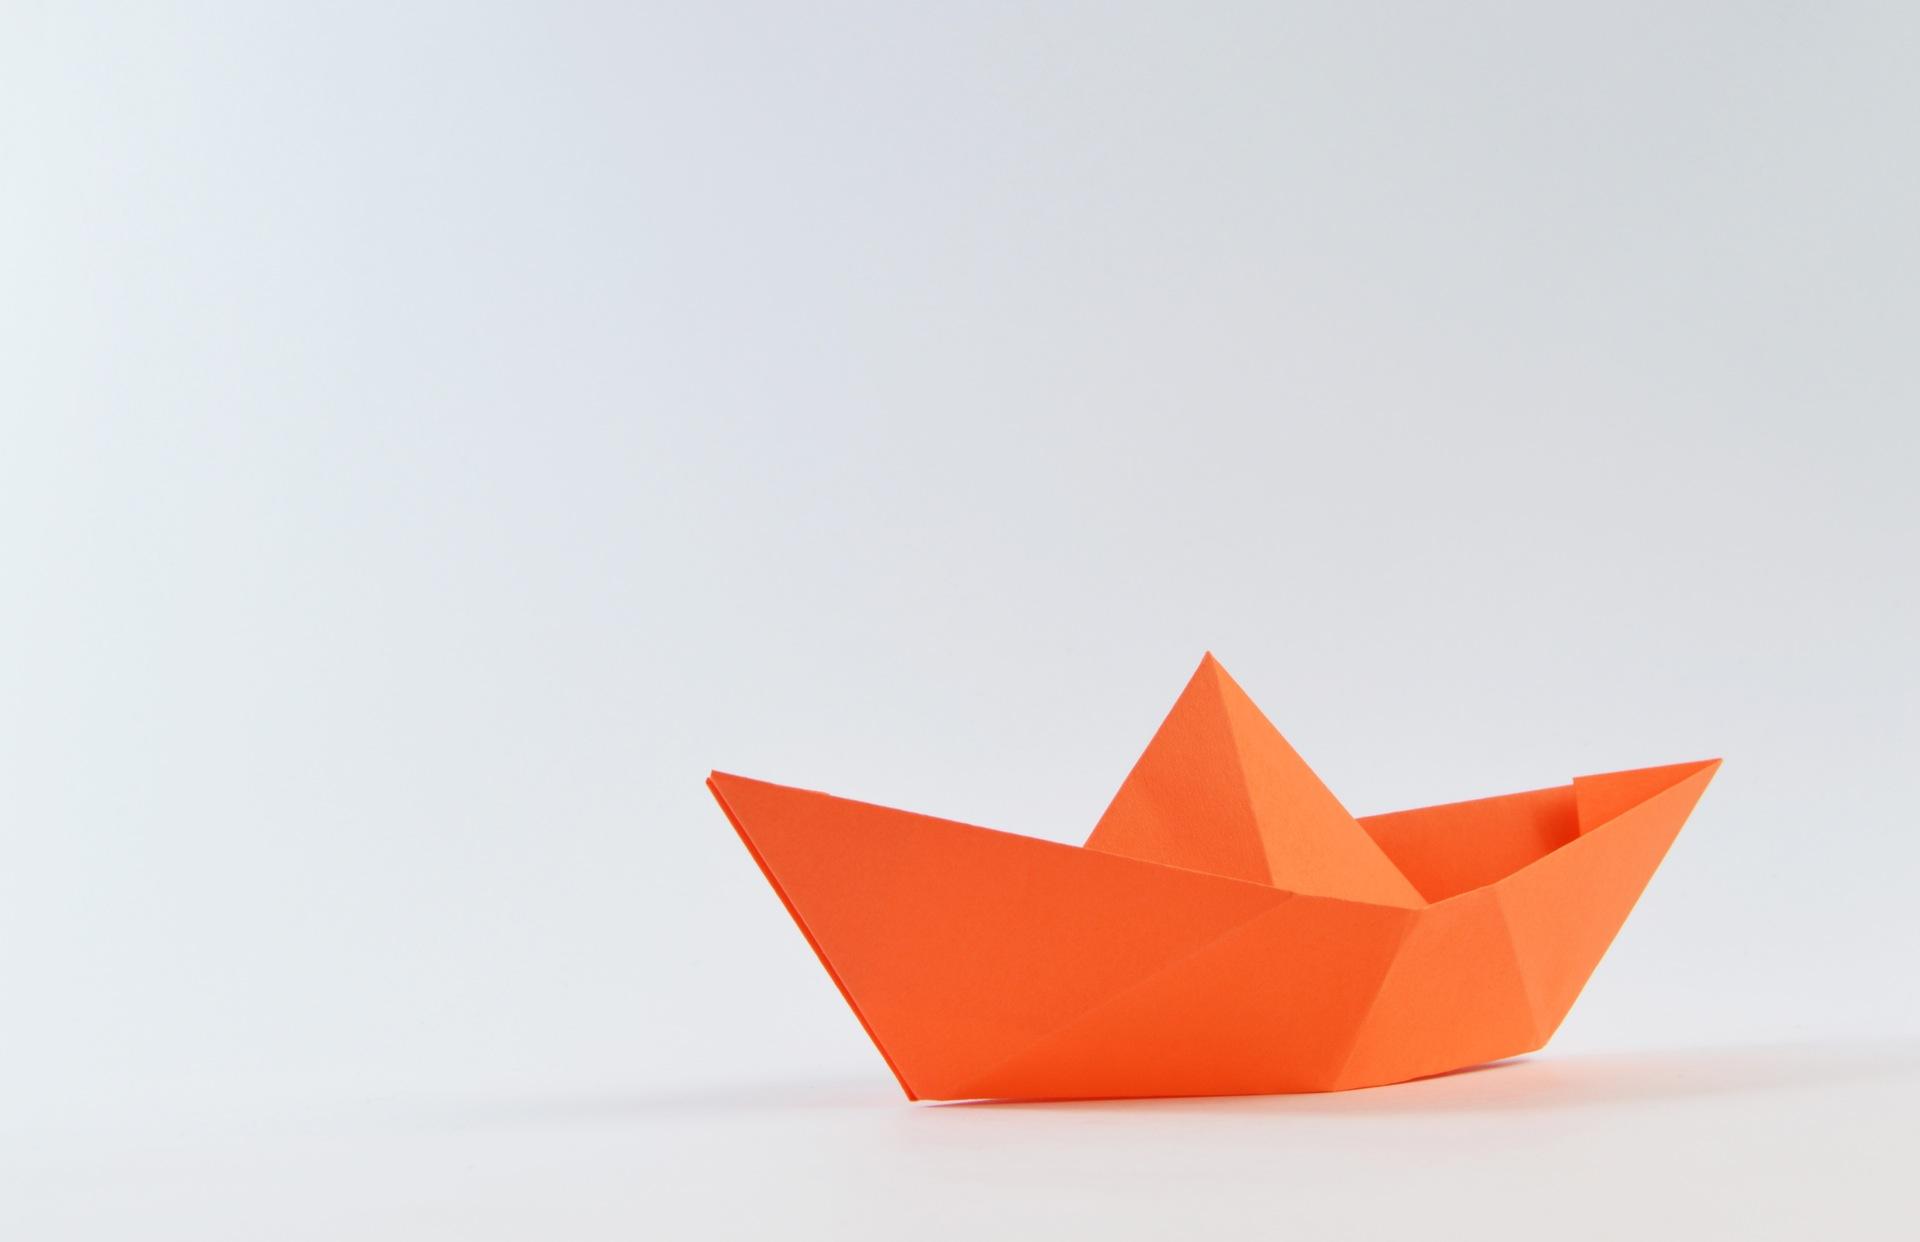 barca, carta, minimalista, Origami, Orange - Sfondi HD - Professor-falken.com